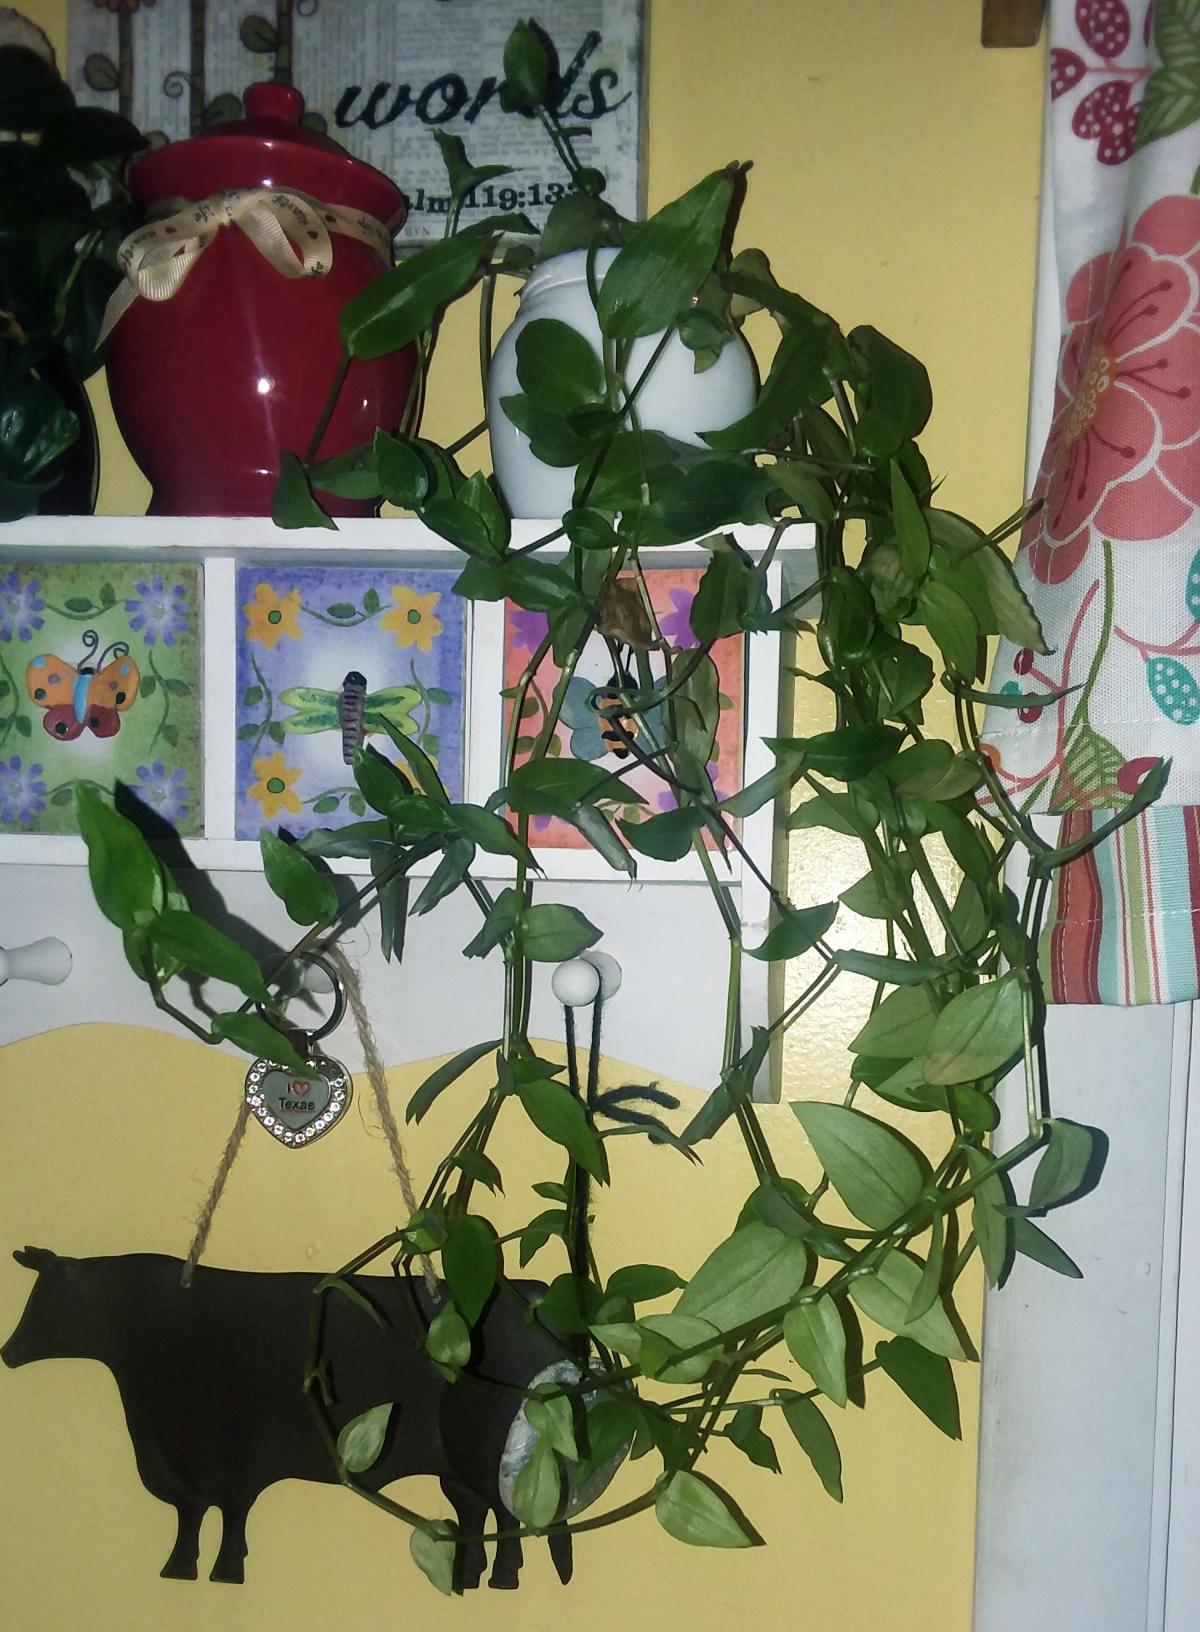 That Plant